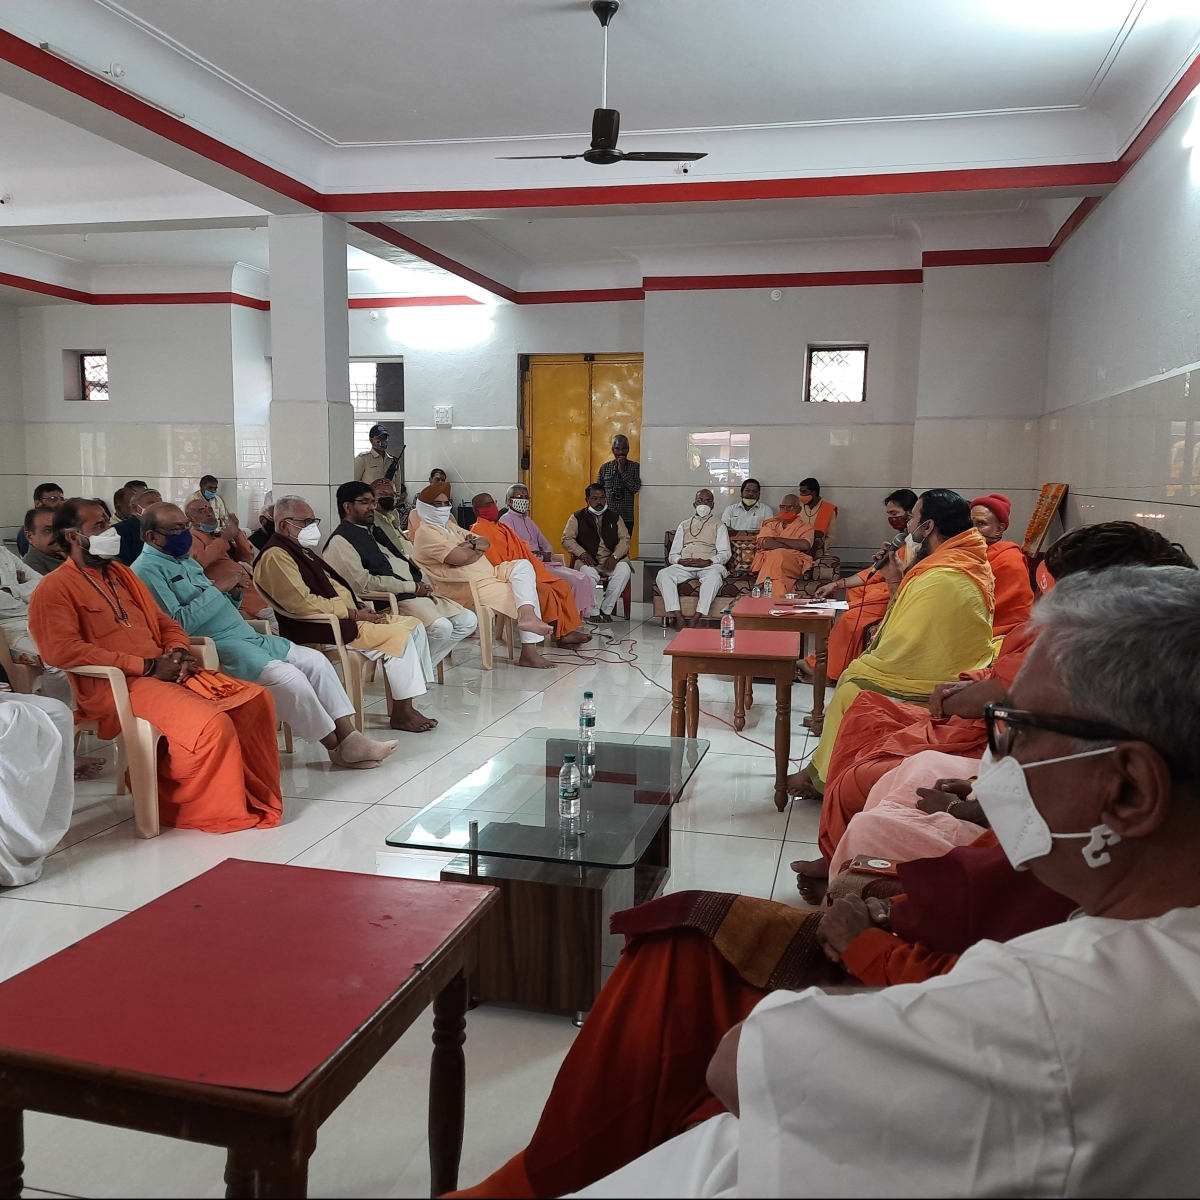 Ujjain: 'Govt has converted Mahakal Temple into commercial venture'